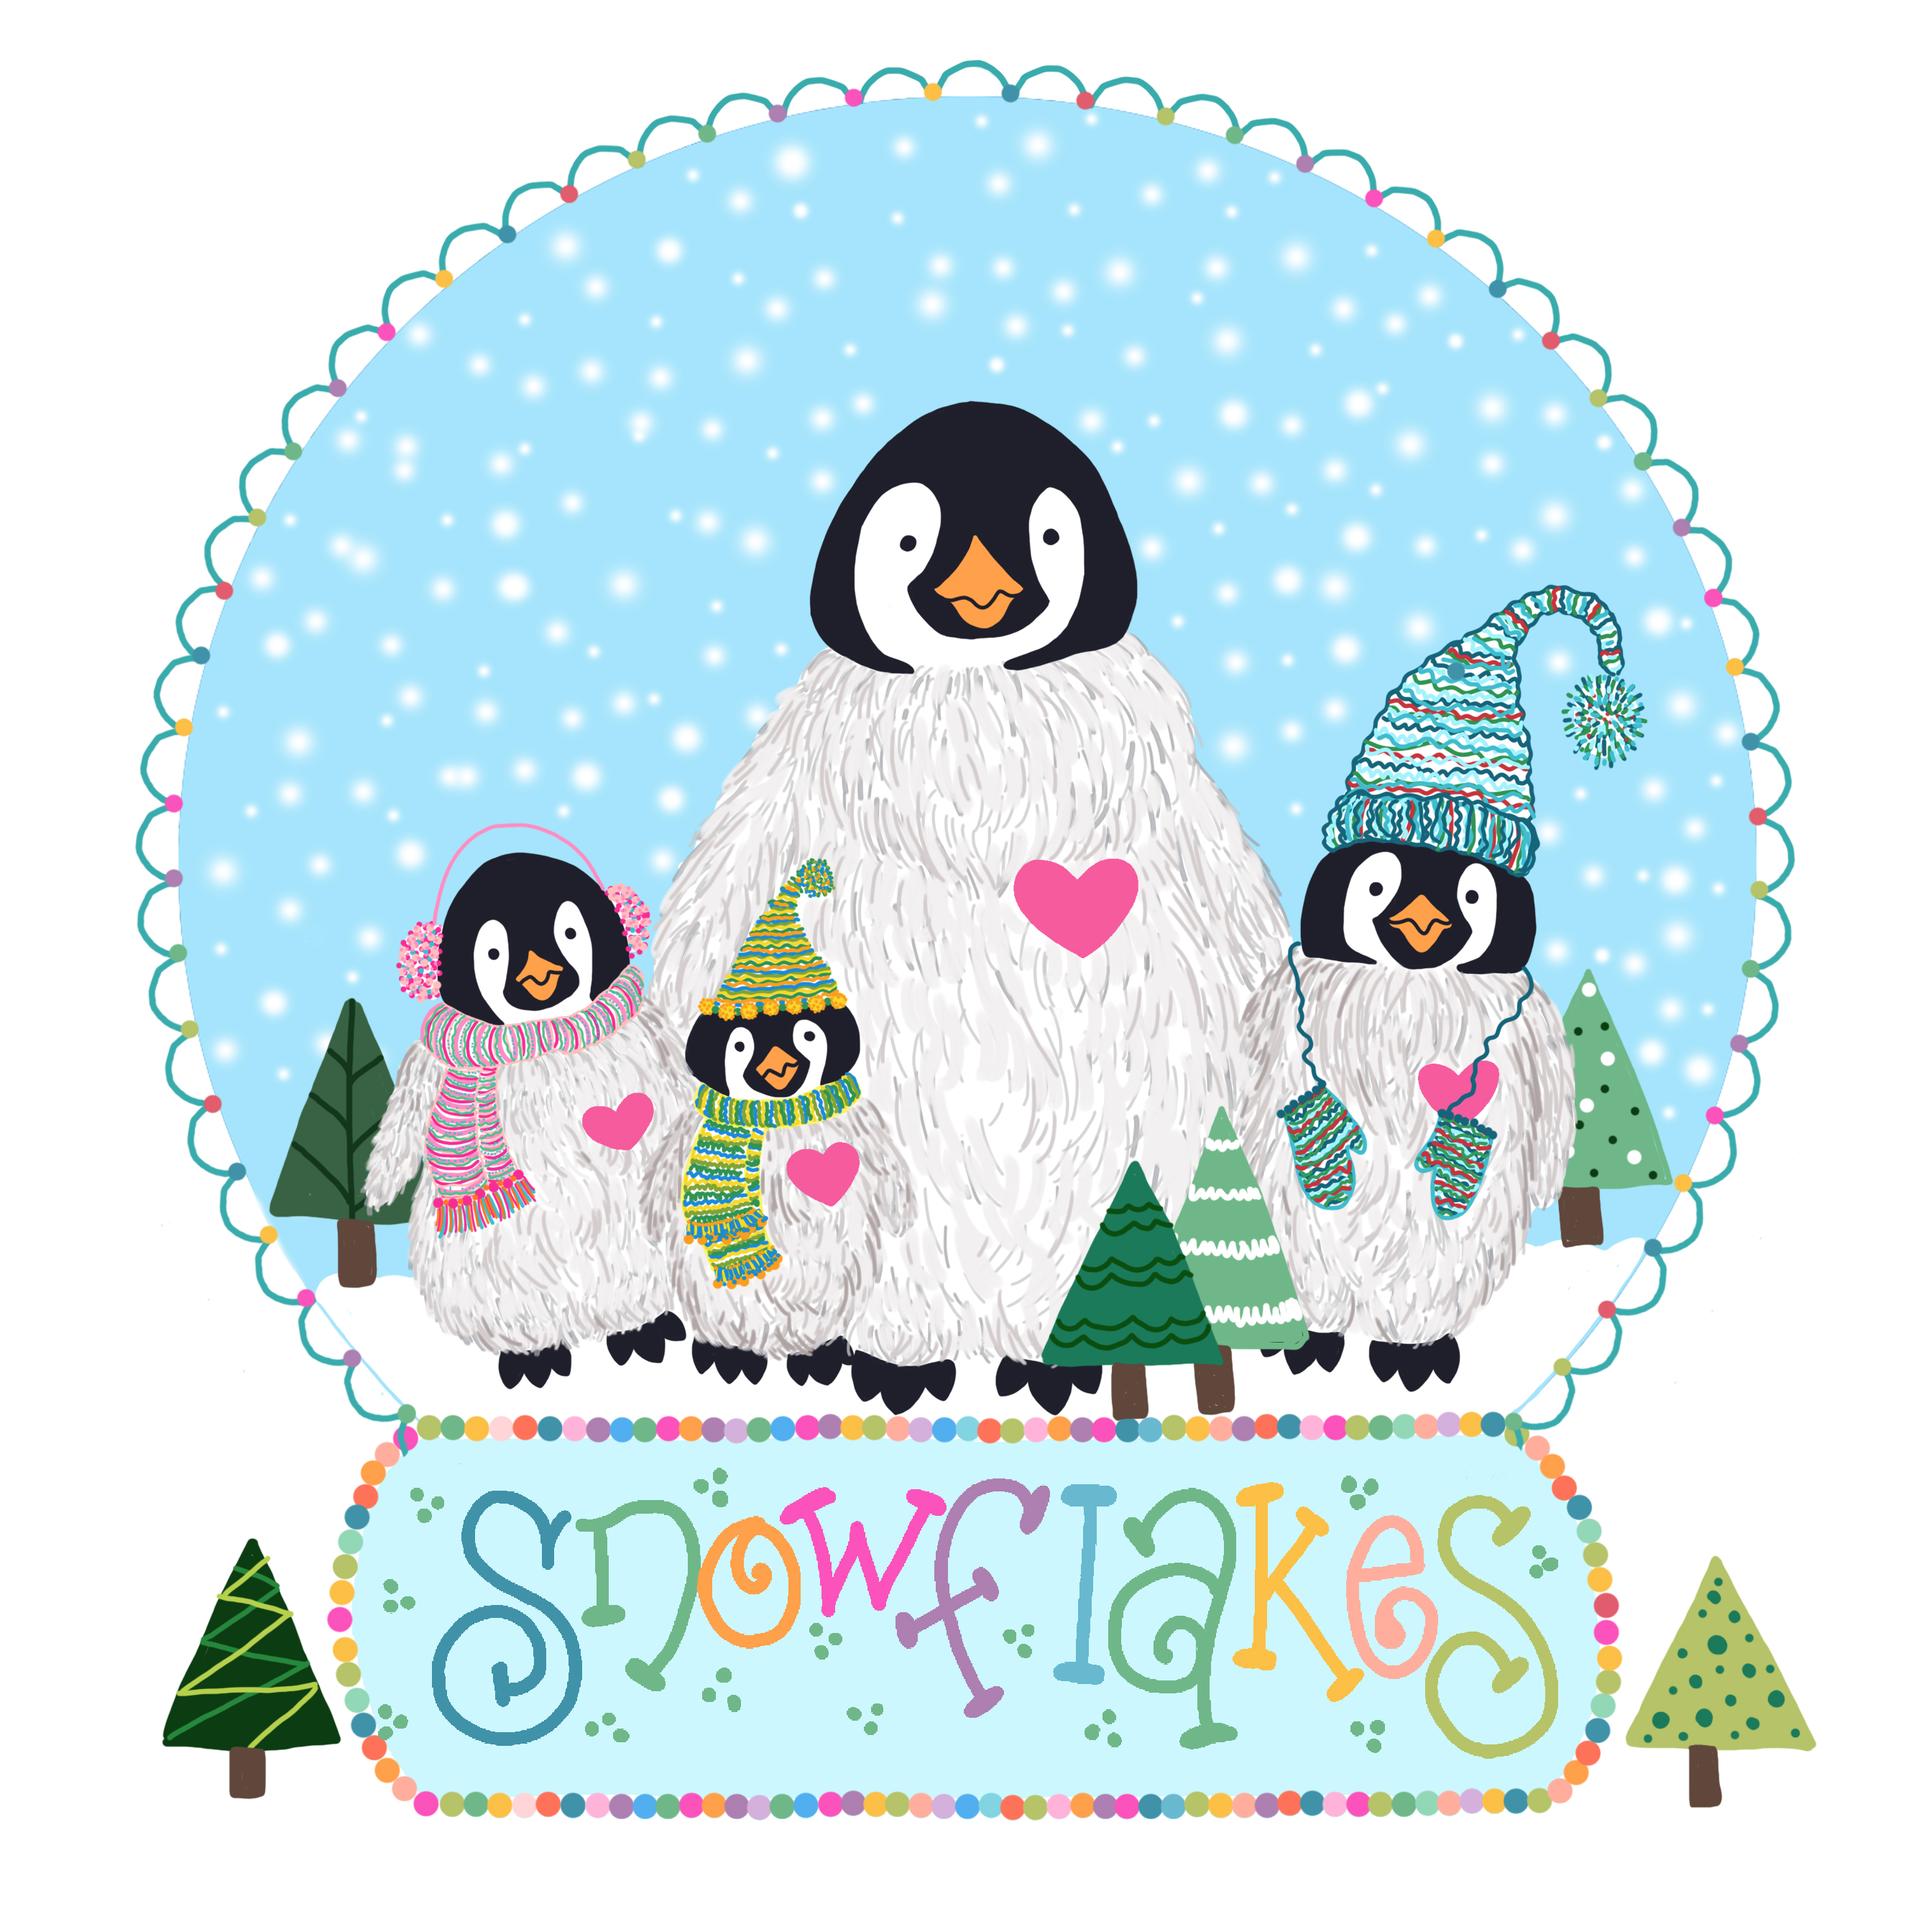 penguin snowglobe by janet nimiroski